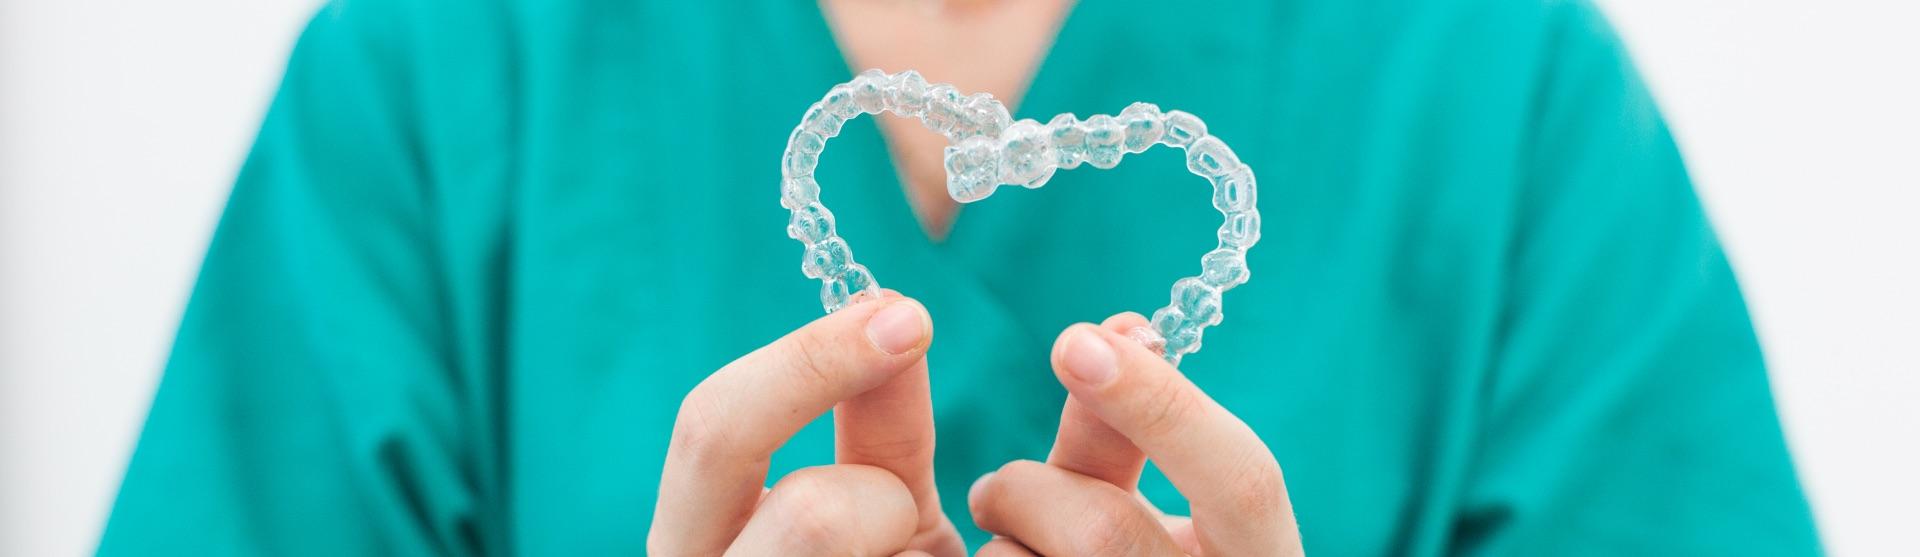 Clinica CBO | News ortodonzia trasparente